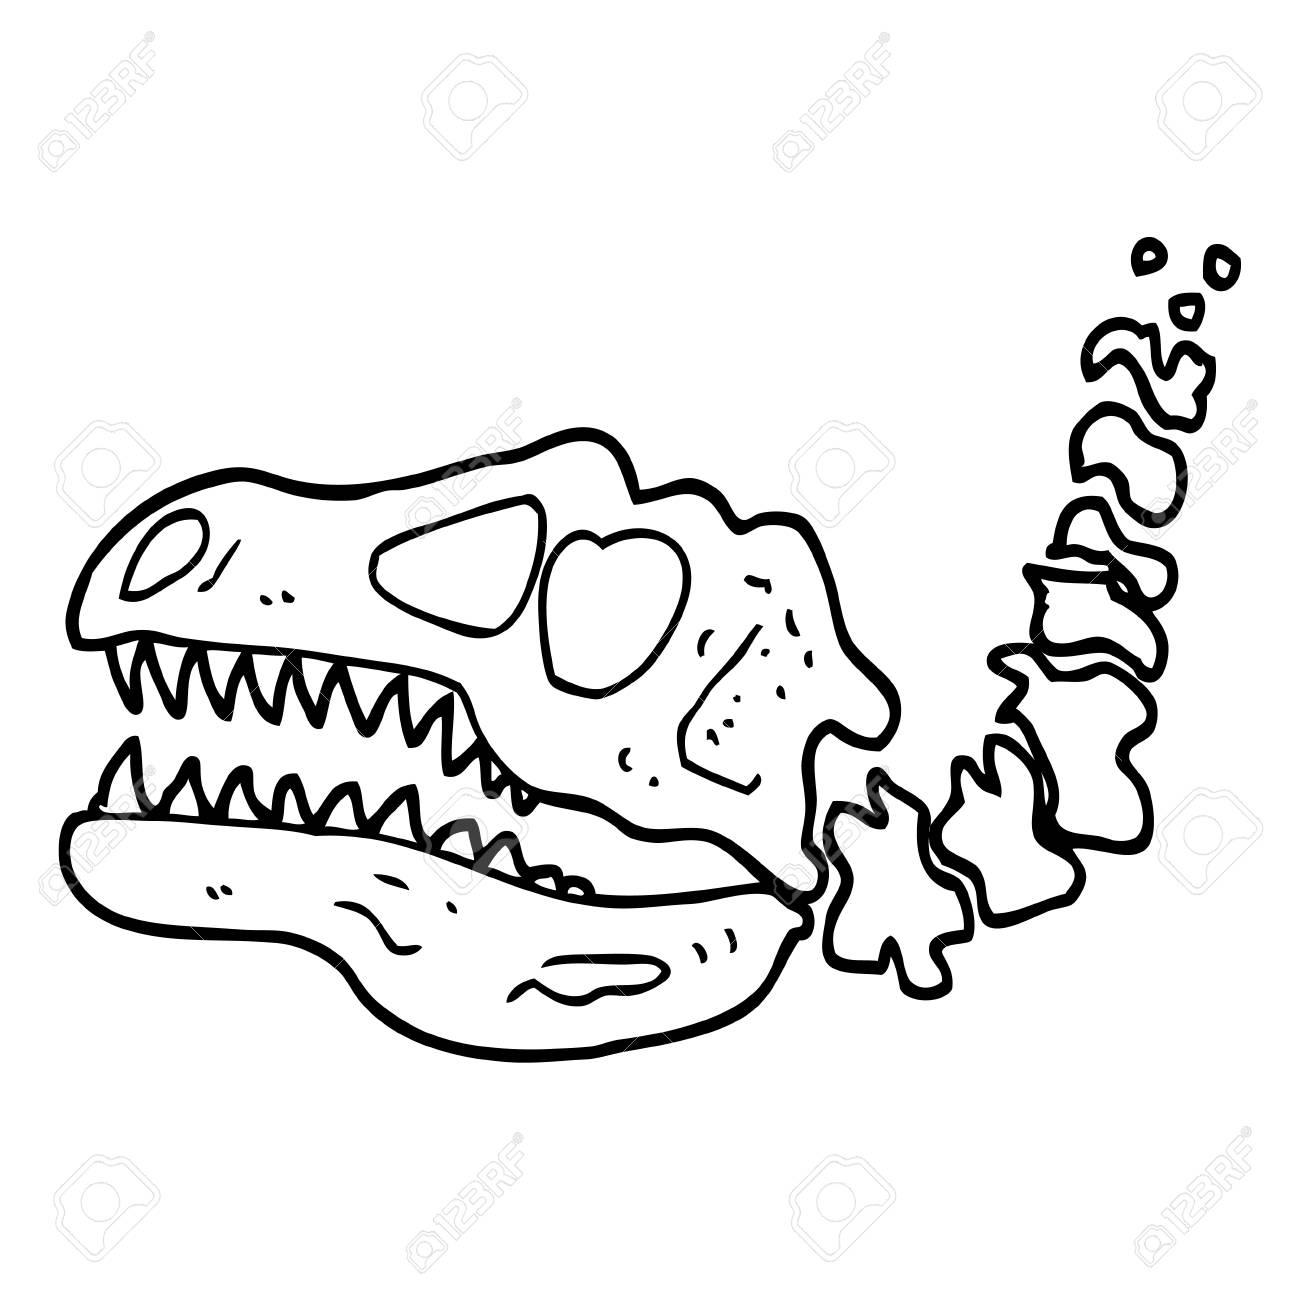 black and white cartoon dinosaur bones.